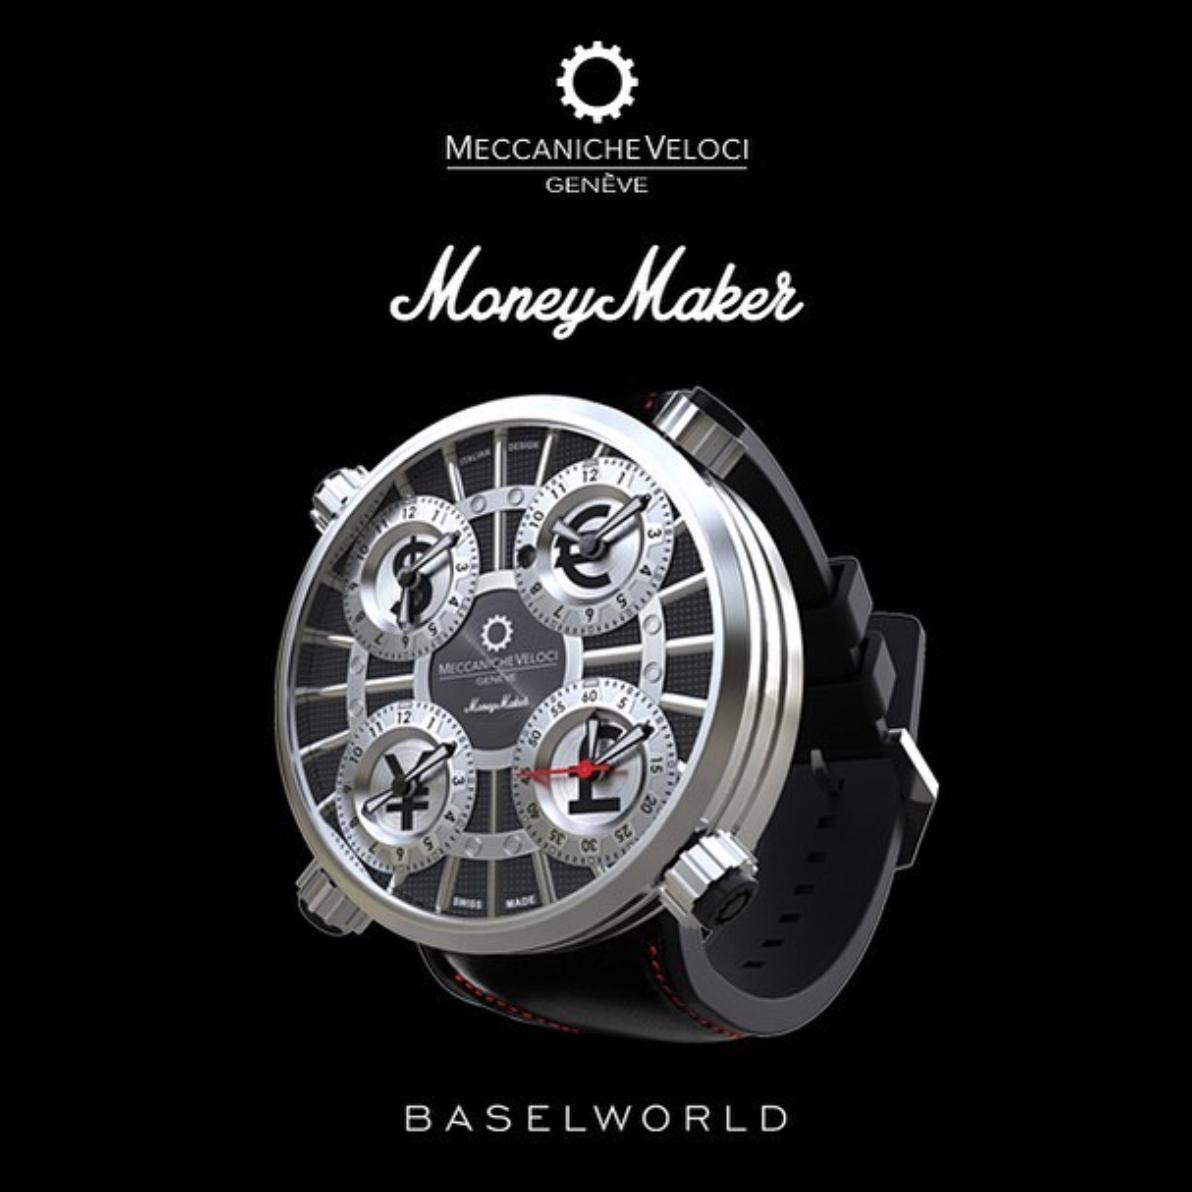 【MECCANICHE VELOCI メカニケ・ヴェローチ】MoneyMaker black マネーメーカー(ブラック) 世界限定250本/正規輸入品